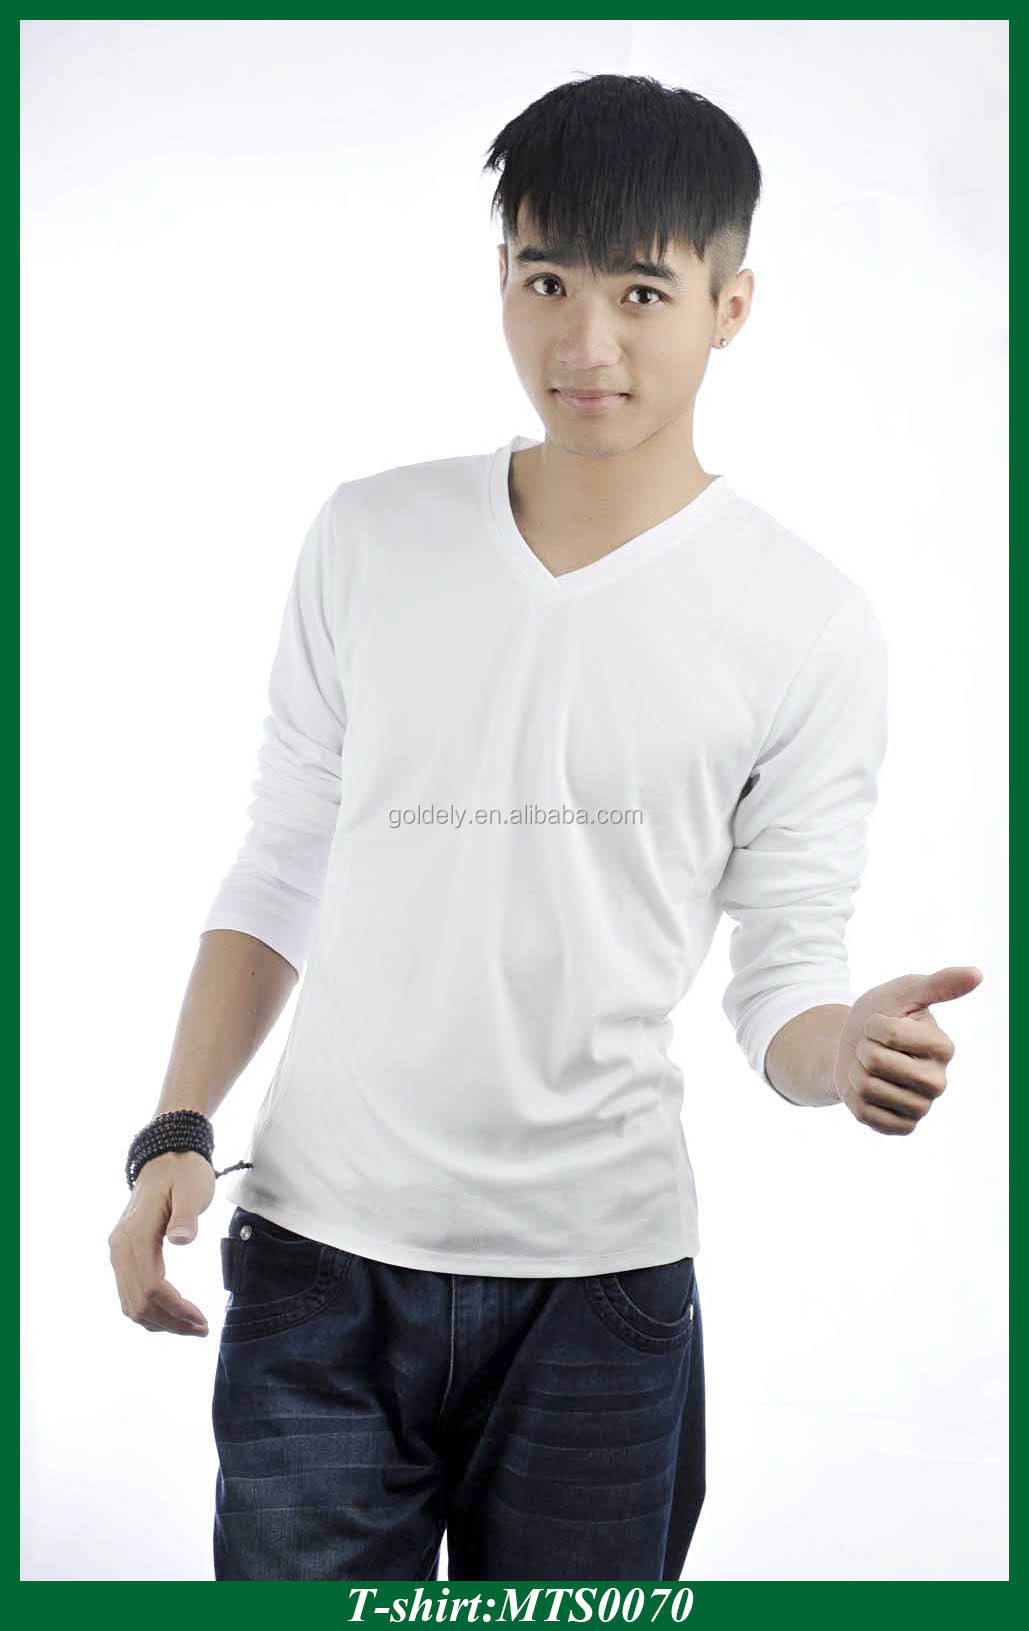 white t shirt21.jpg